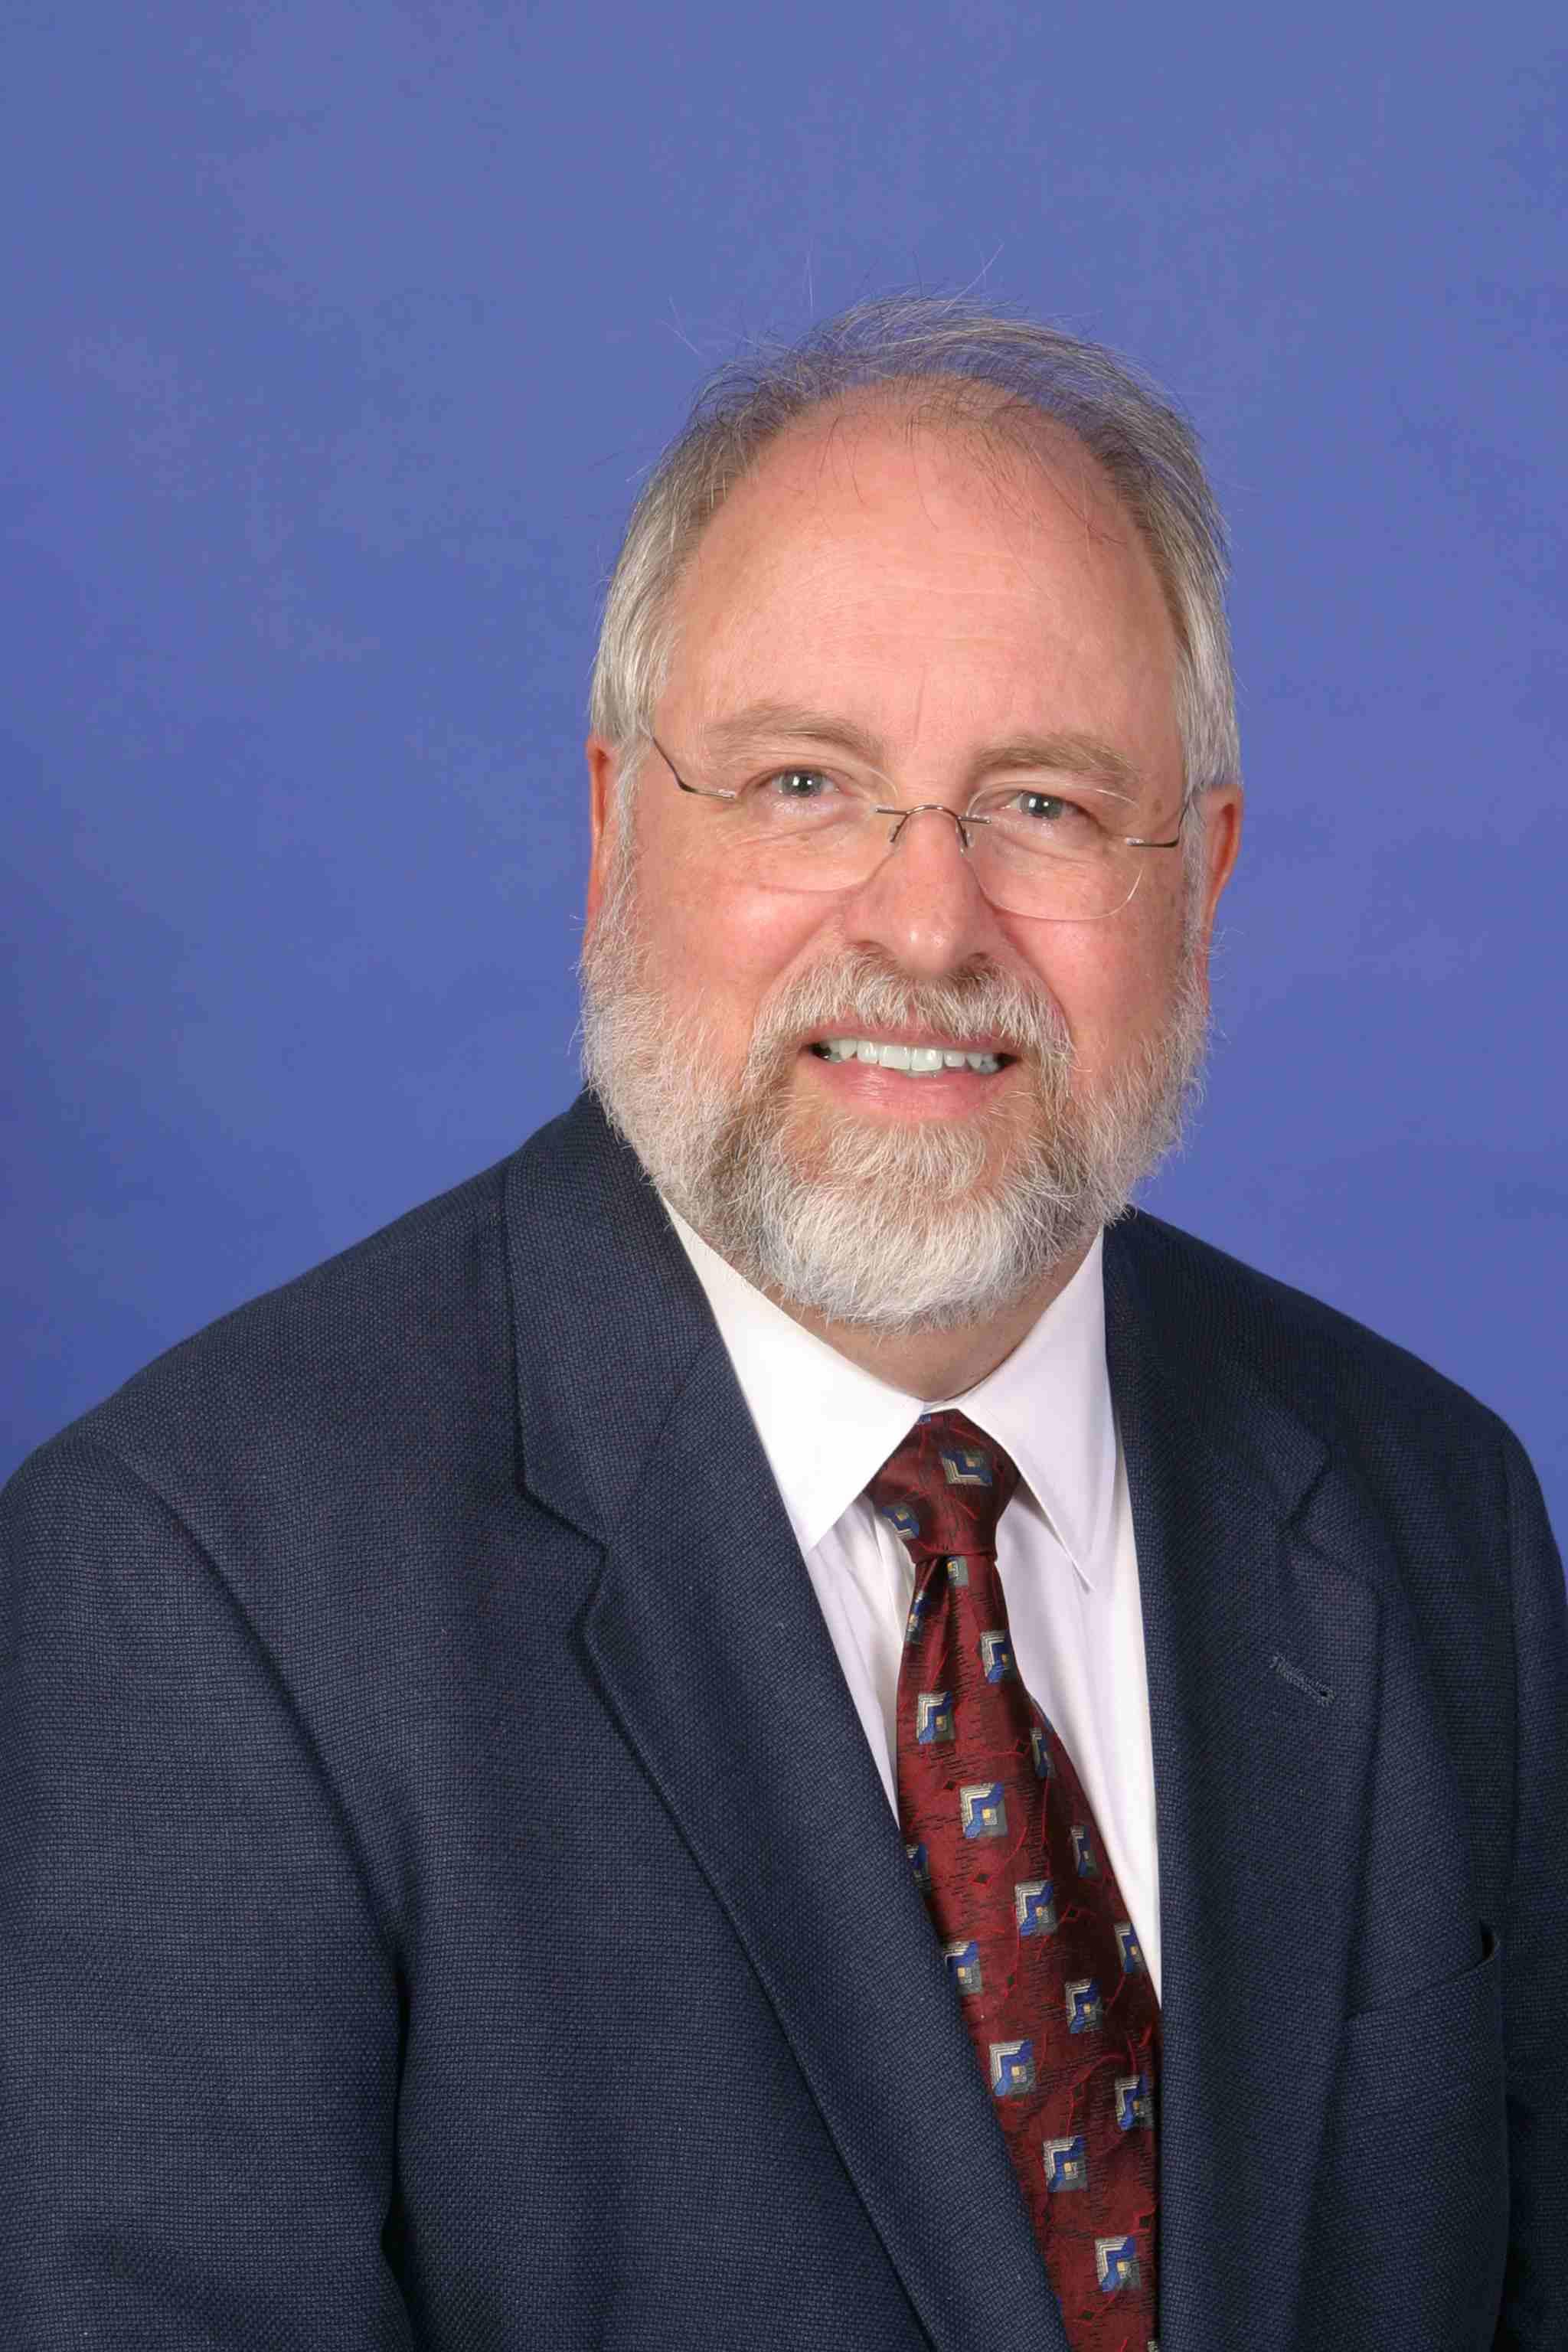 Representative Barnhart